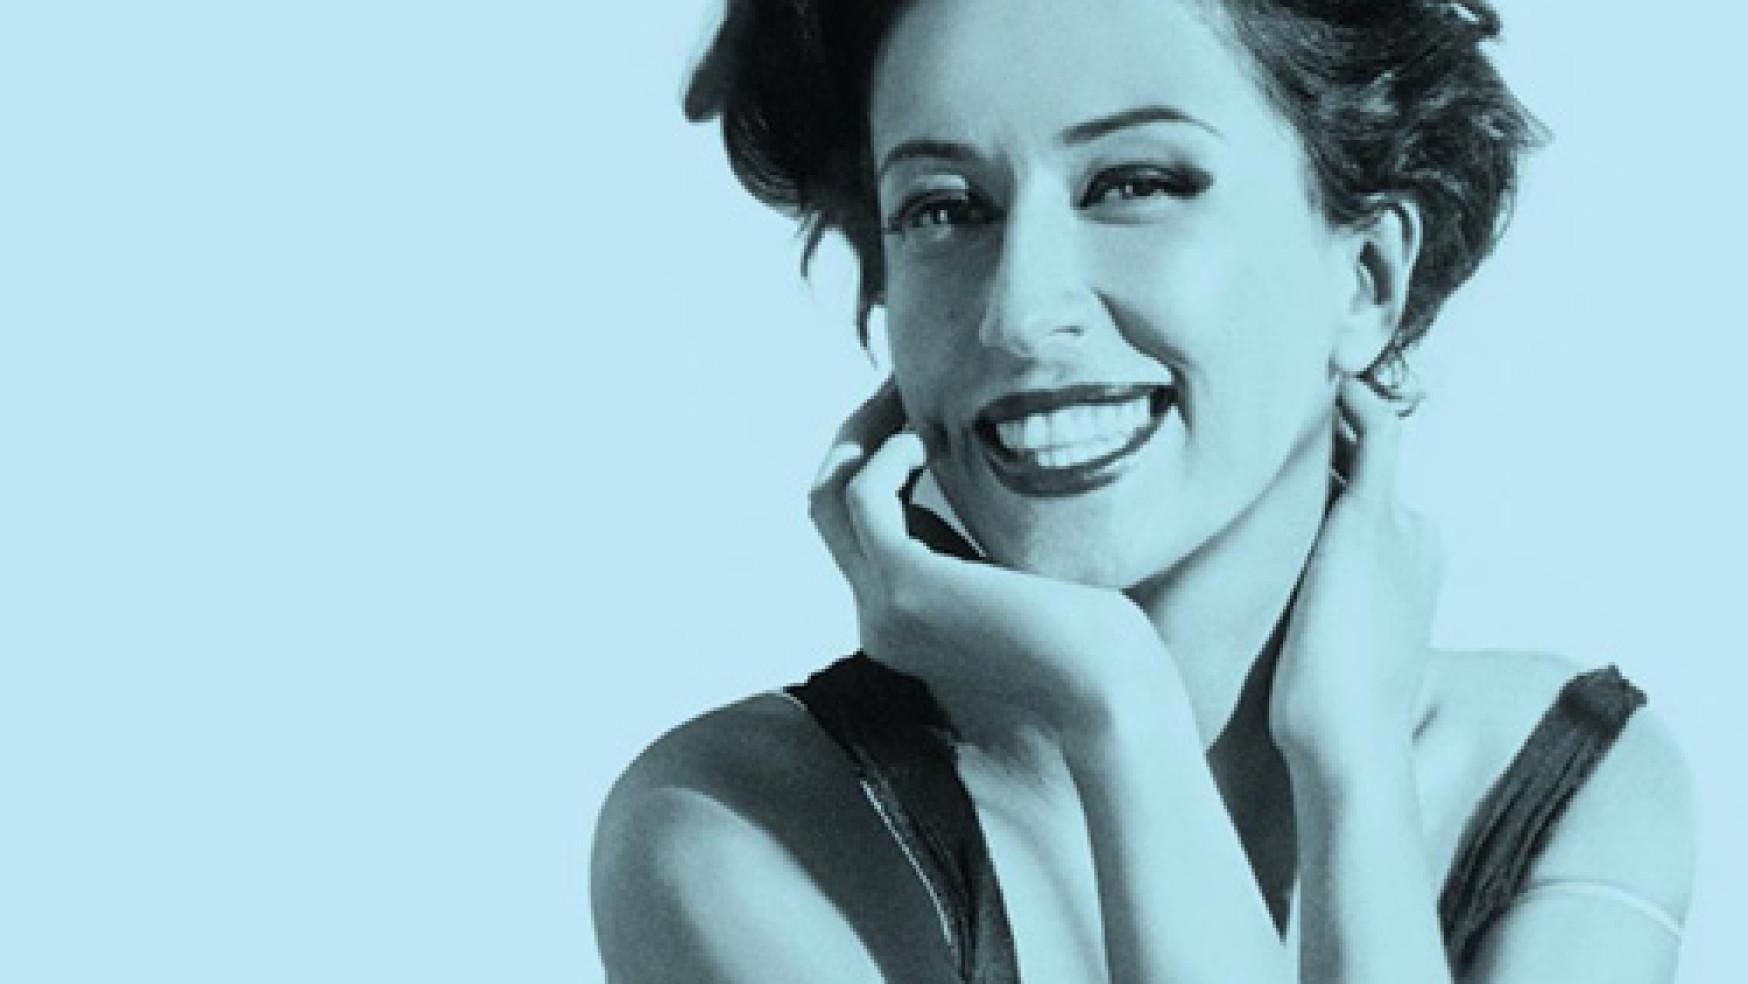 Ana Moura atua no programa da BBC 'Later…with Jools Holland'